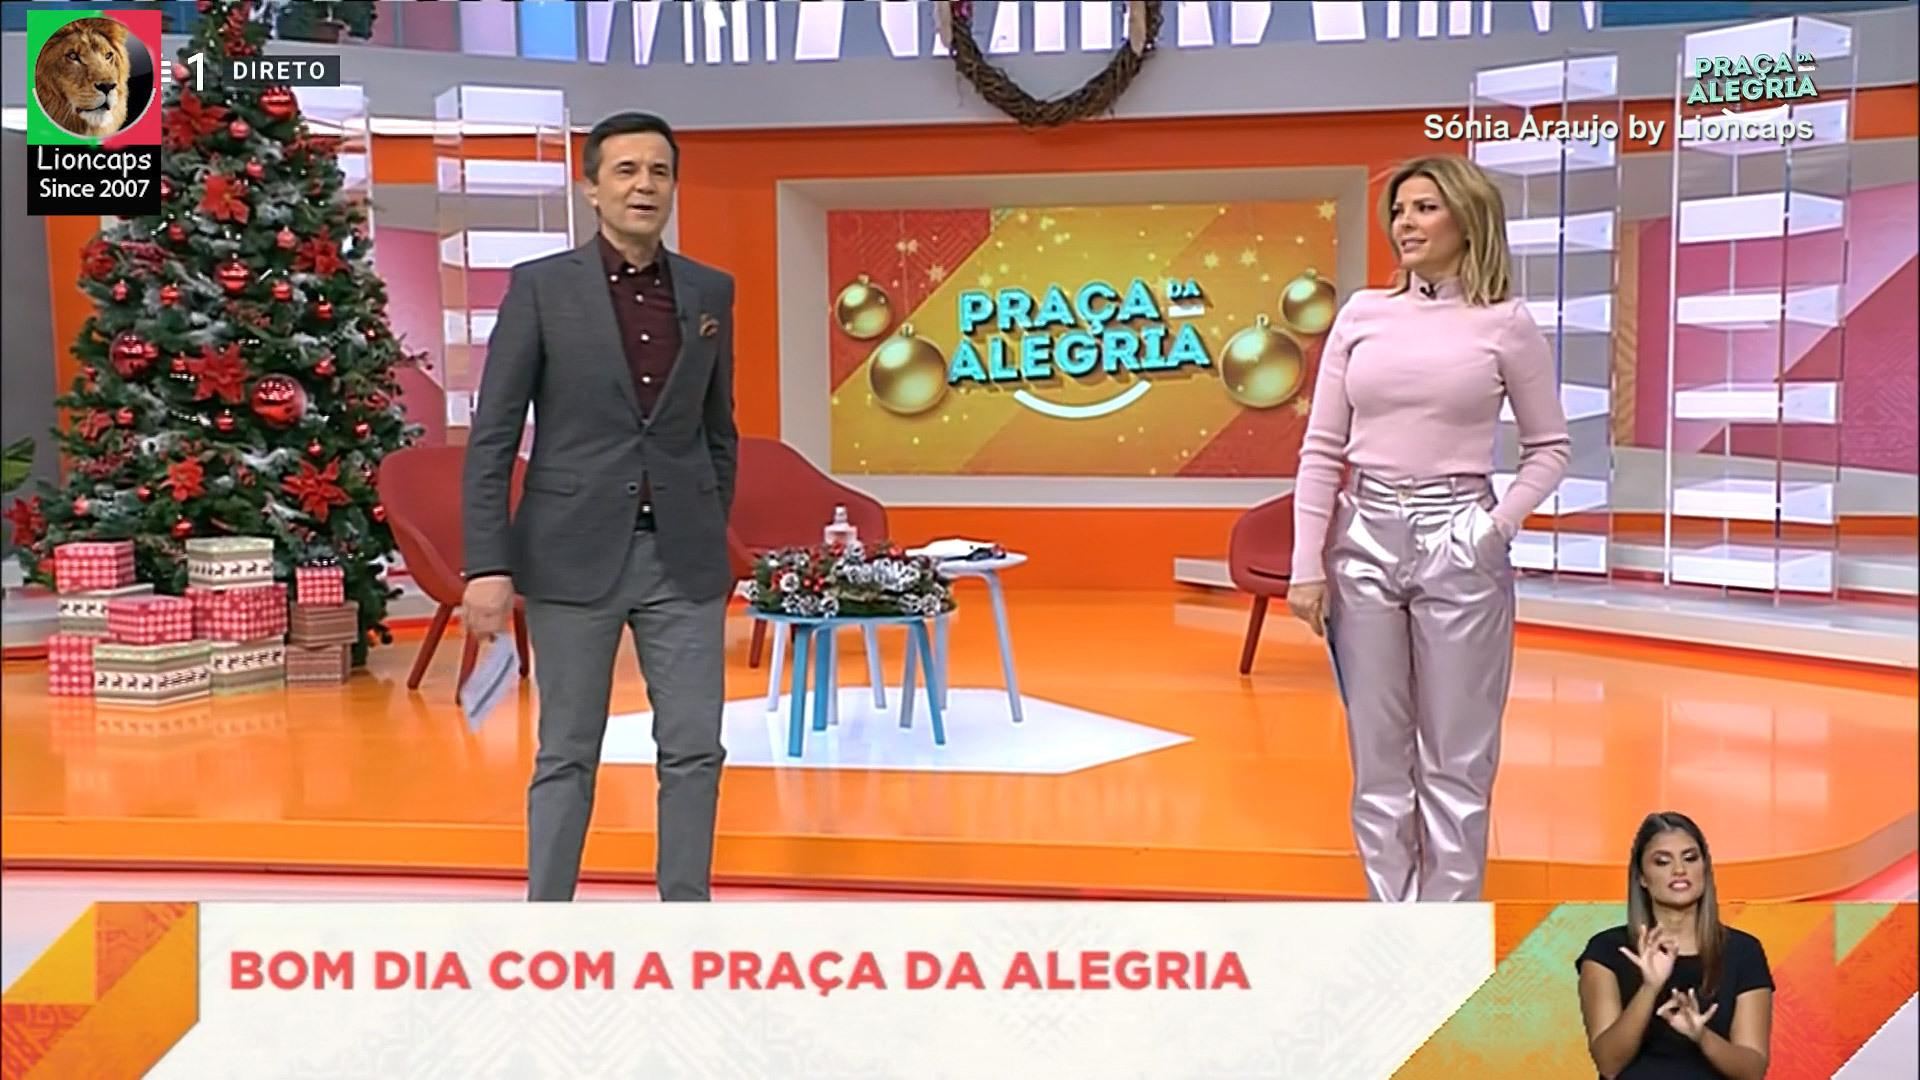 sonia_araujo_praca_lioncaps_27_03_2021_02 (10).jpg